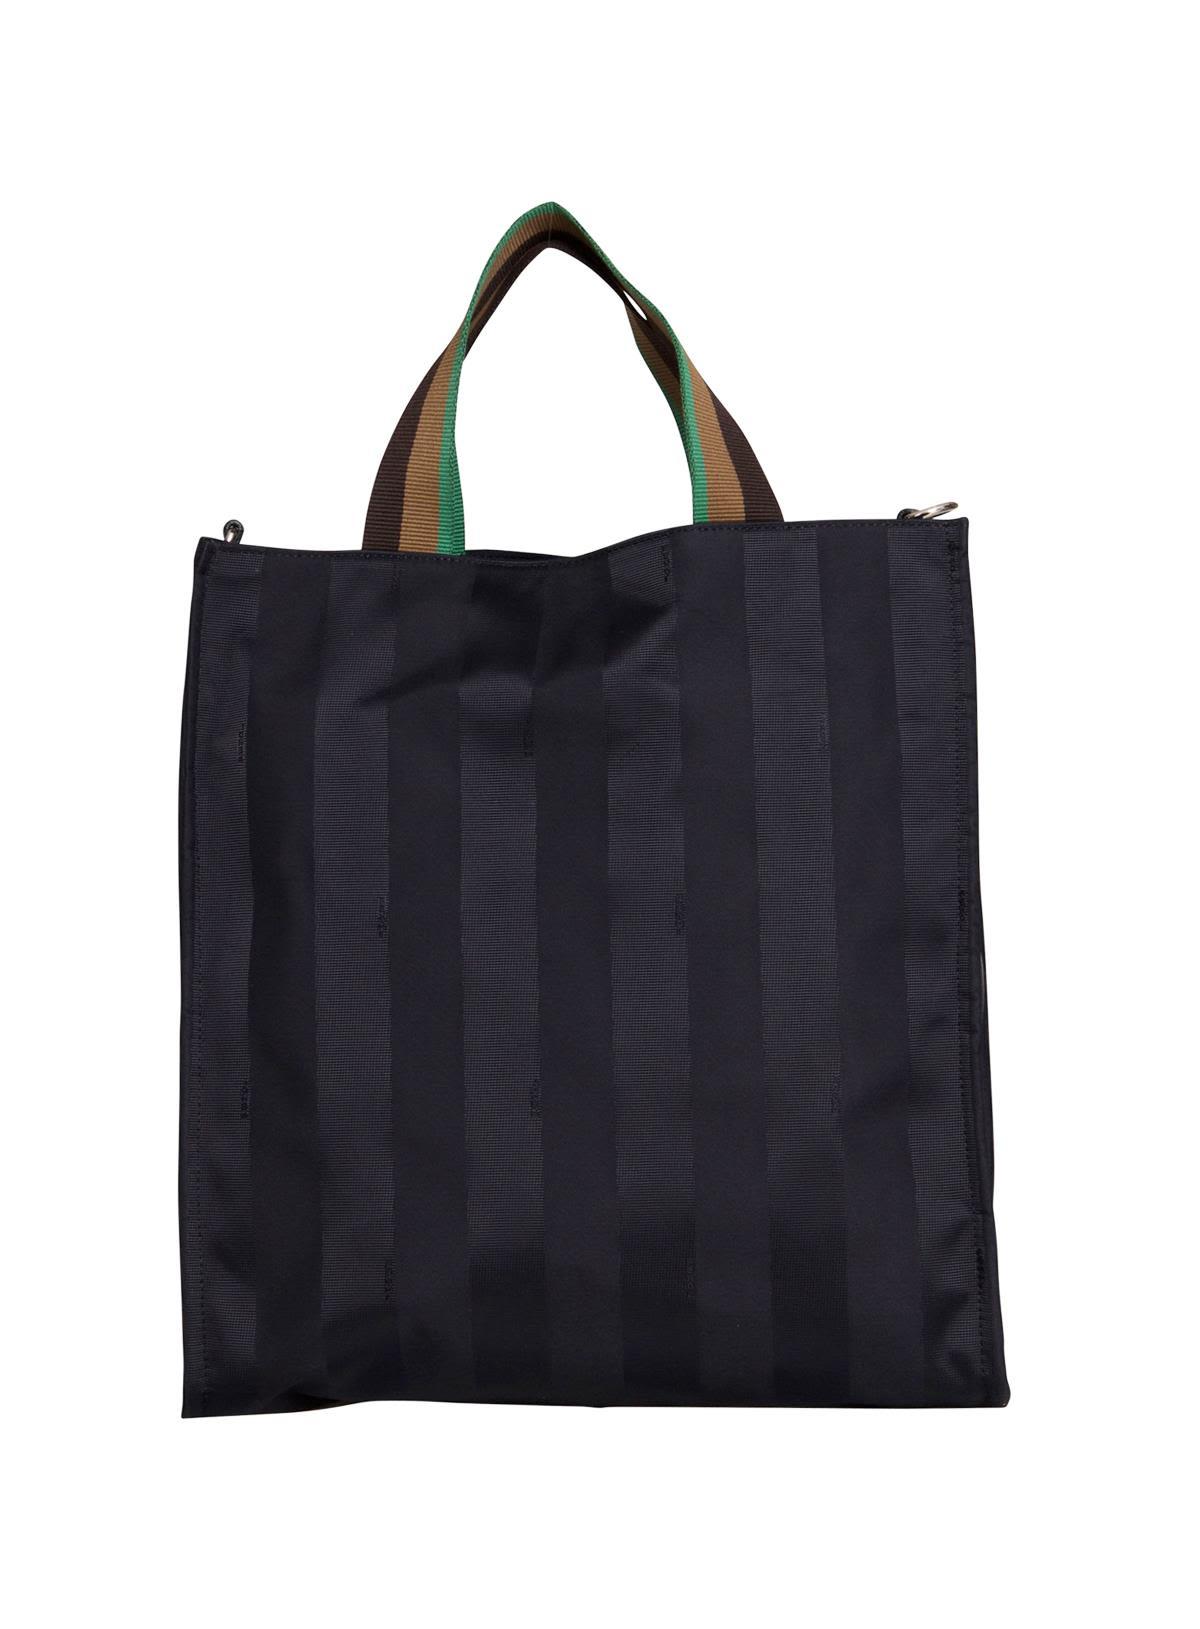 1c6ef702ef5 Fendi Fendi Black Canvas Bag In Black - Black - 10855959